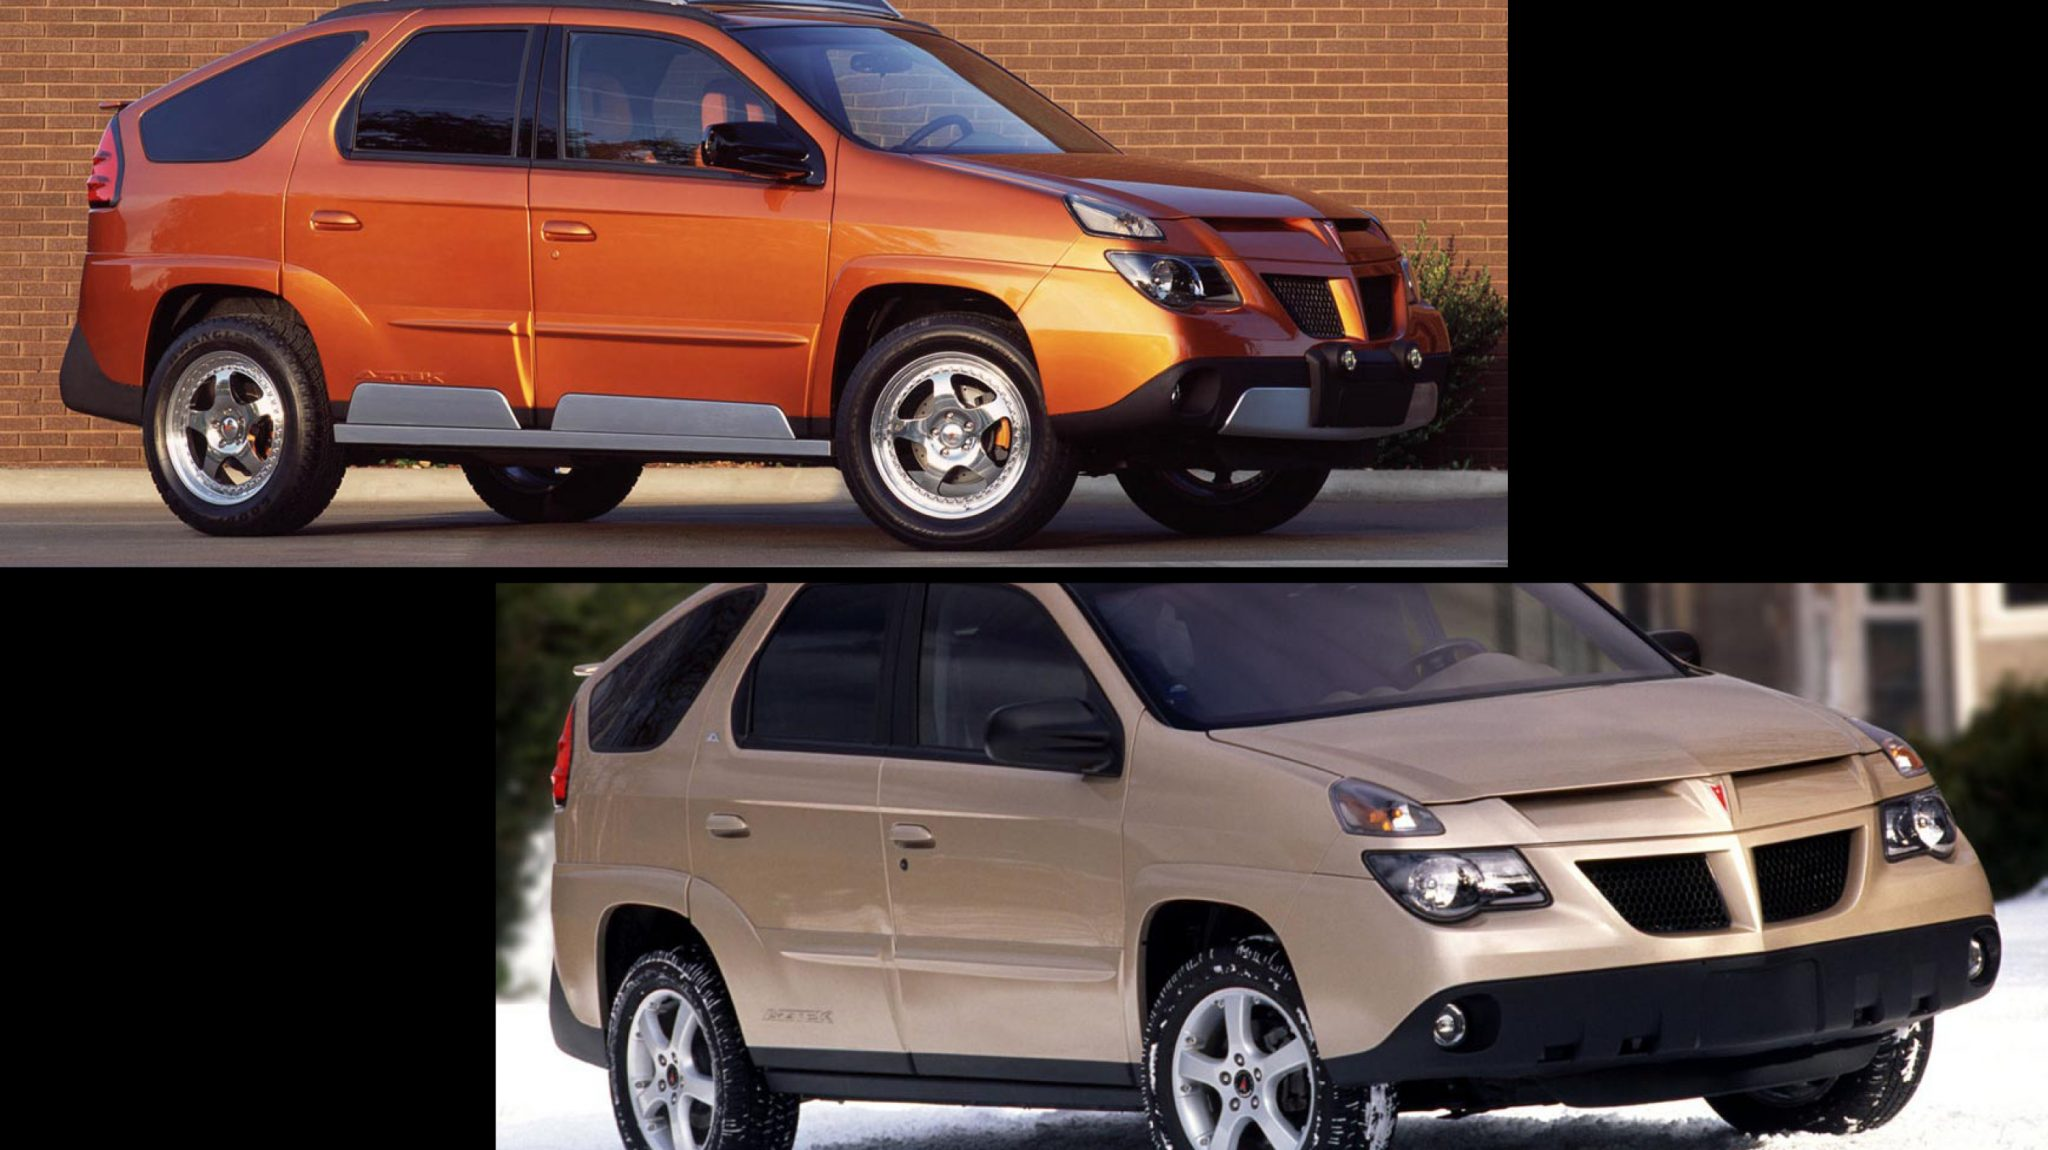 Pontiac Aztek Facelift vs Pre-facelift